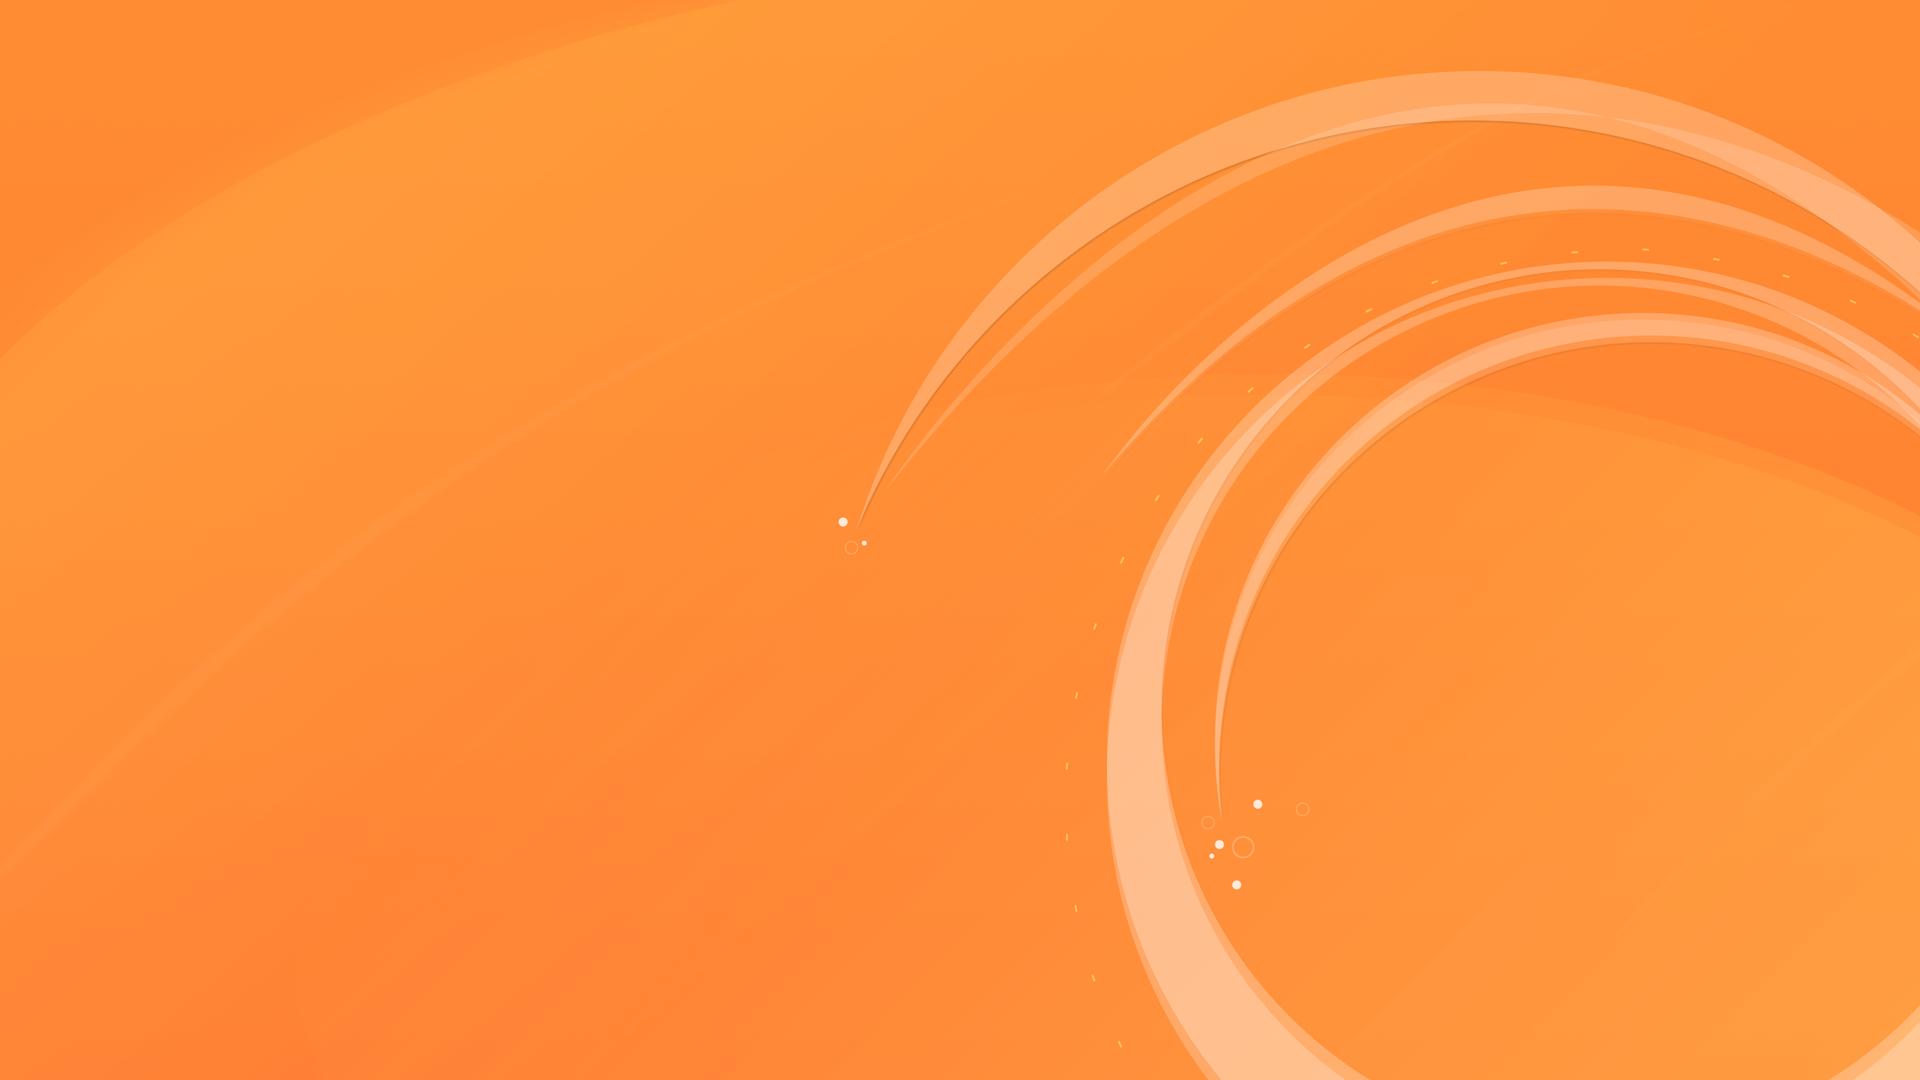 Circular-Orange-Wallpaper